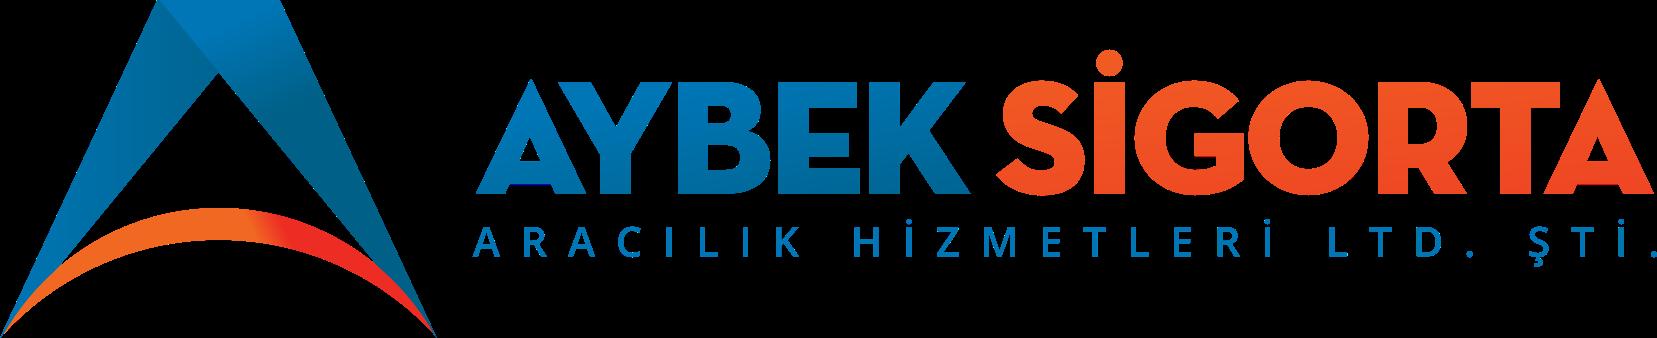 aybek-yatay-logo-1